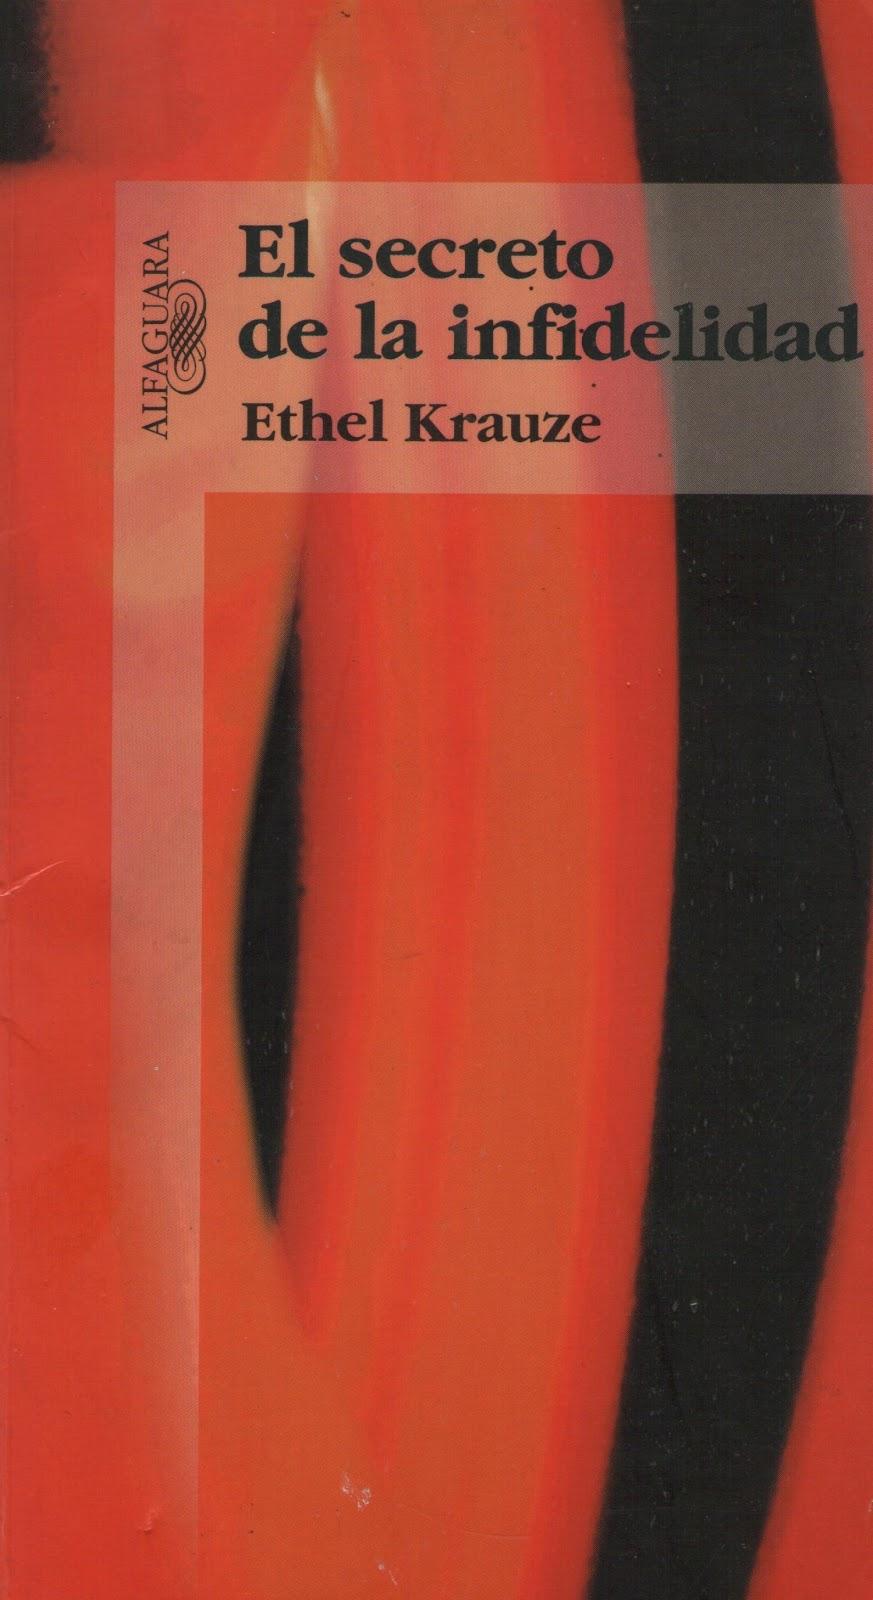 El Secreto De La Infidelidad Ethel Krauze